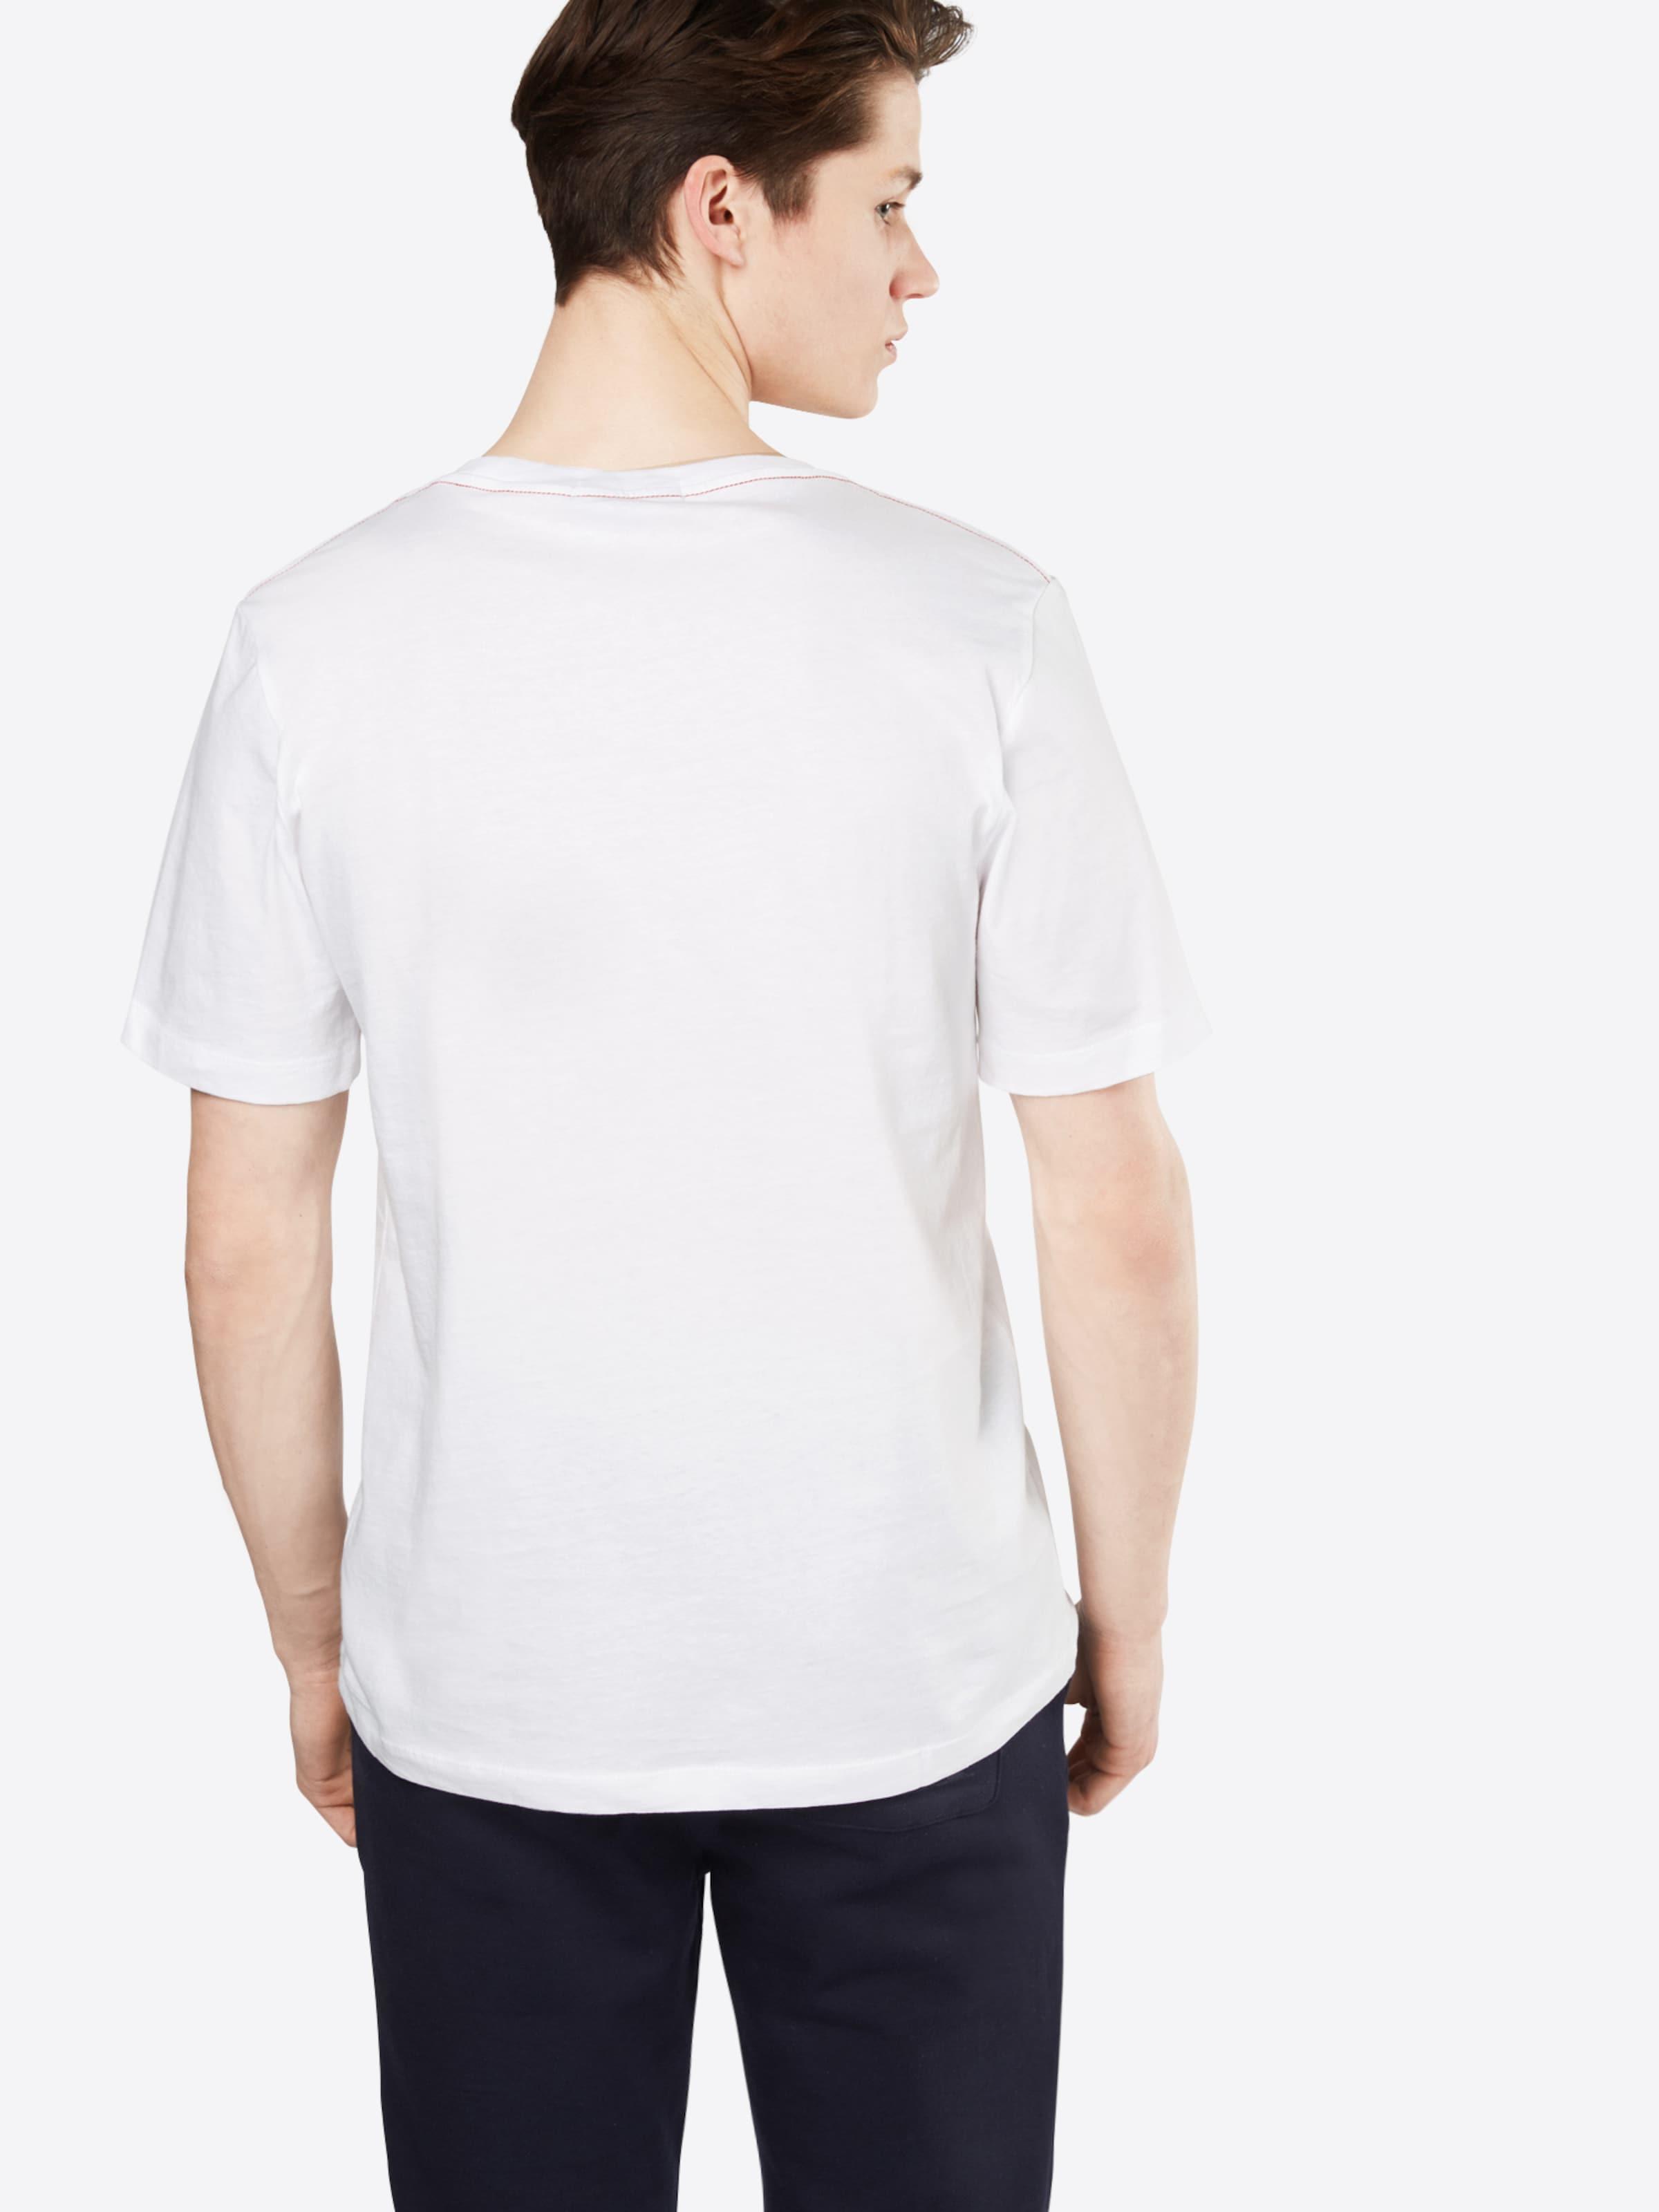 Verkauf Austrittsstellen Billig Verkauf Blick Calvin Klein Jeans T-Shirt 'TREAVIK REGULAR SS' Billig Verkauf Visum Zahlung iWgtNX